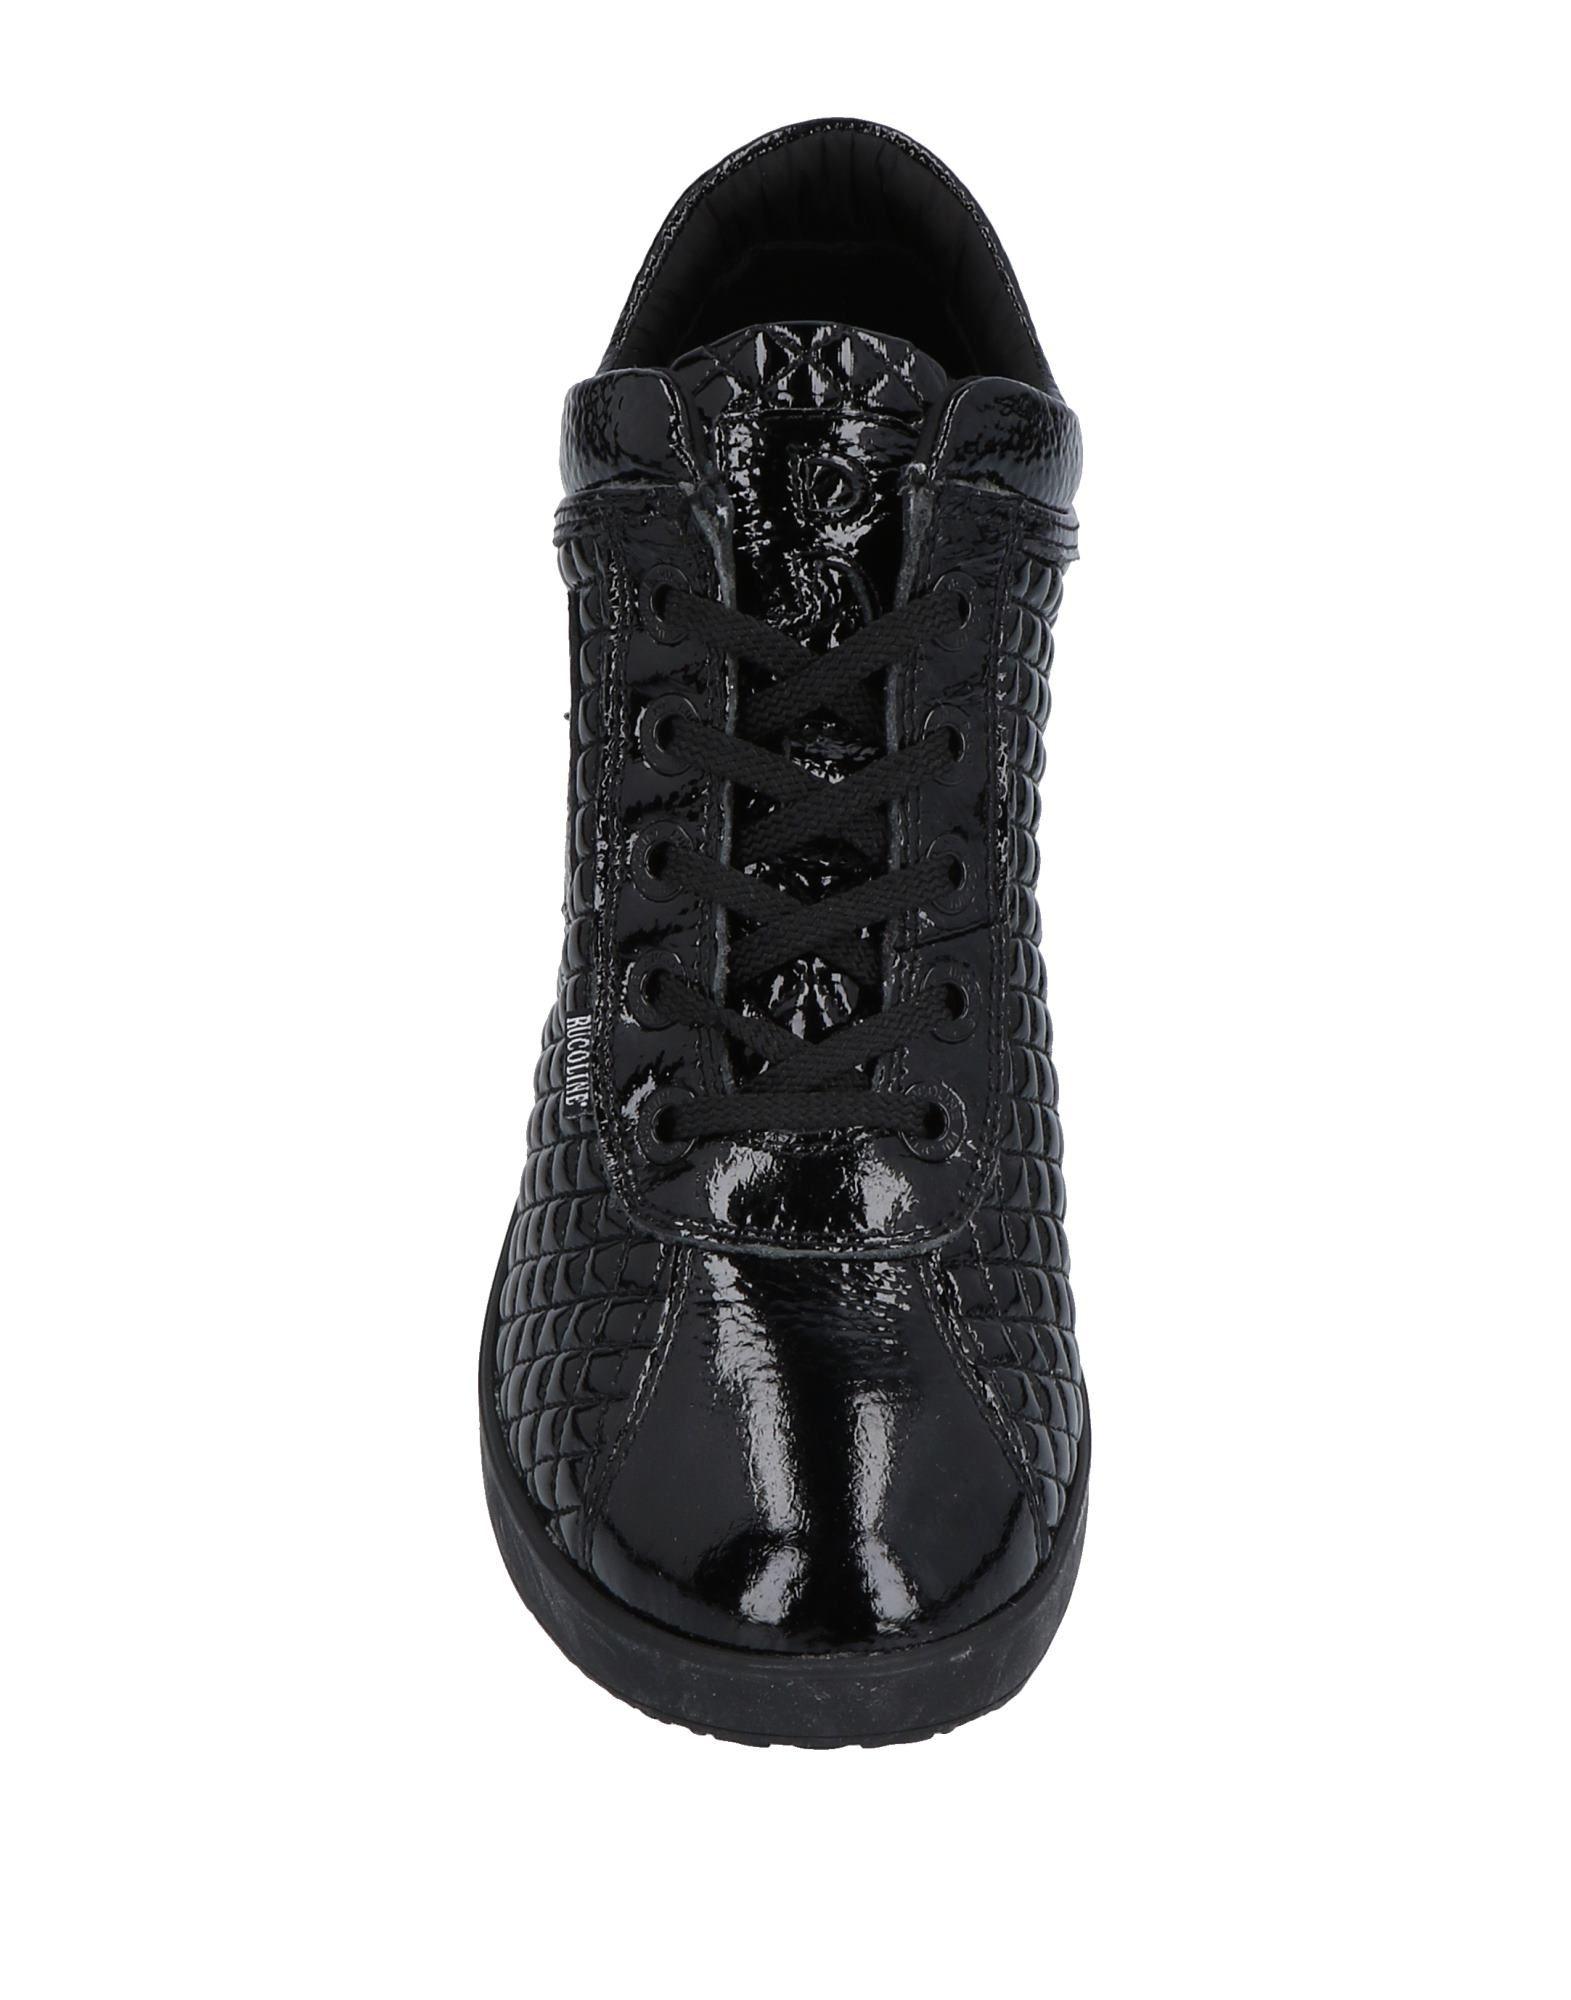 Ruco lohnt Line Sneakers Damen Gutes Preis-Leistungs-Verhältnis, es lohnt Ruco sich 7ebcd1